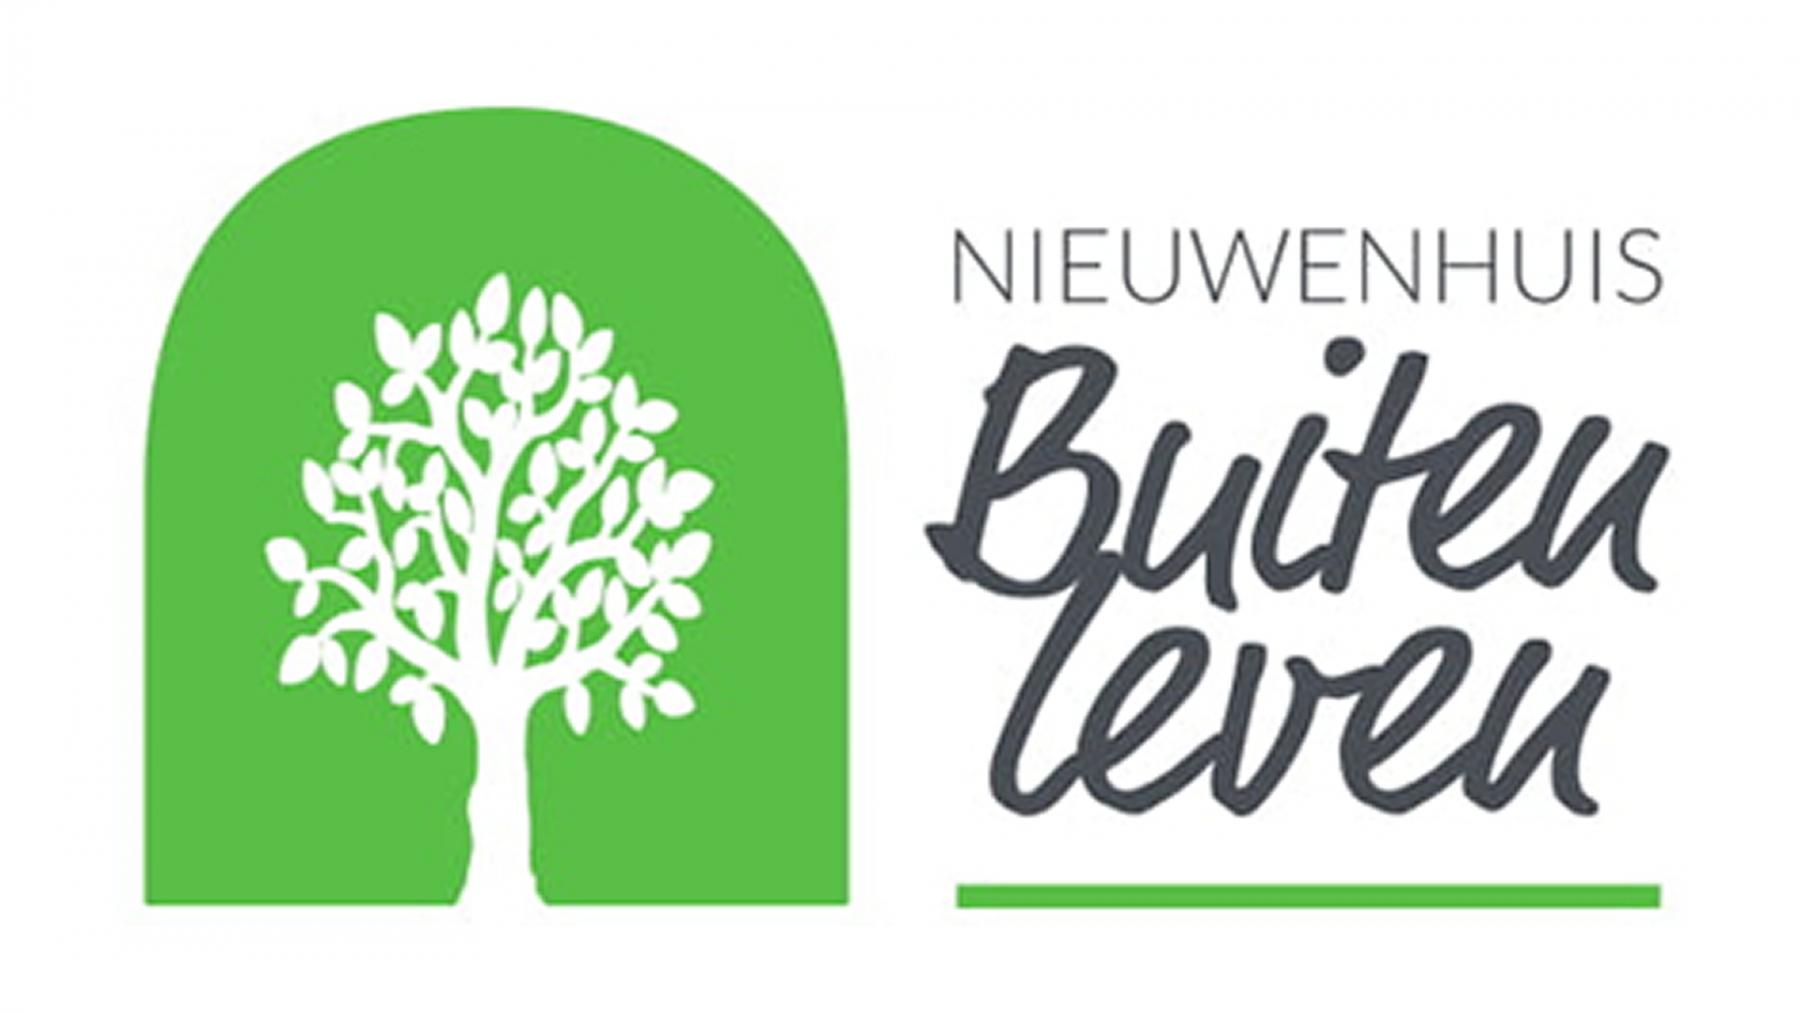 Nieuwenhuis.fw_